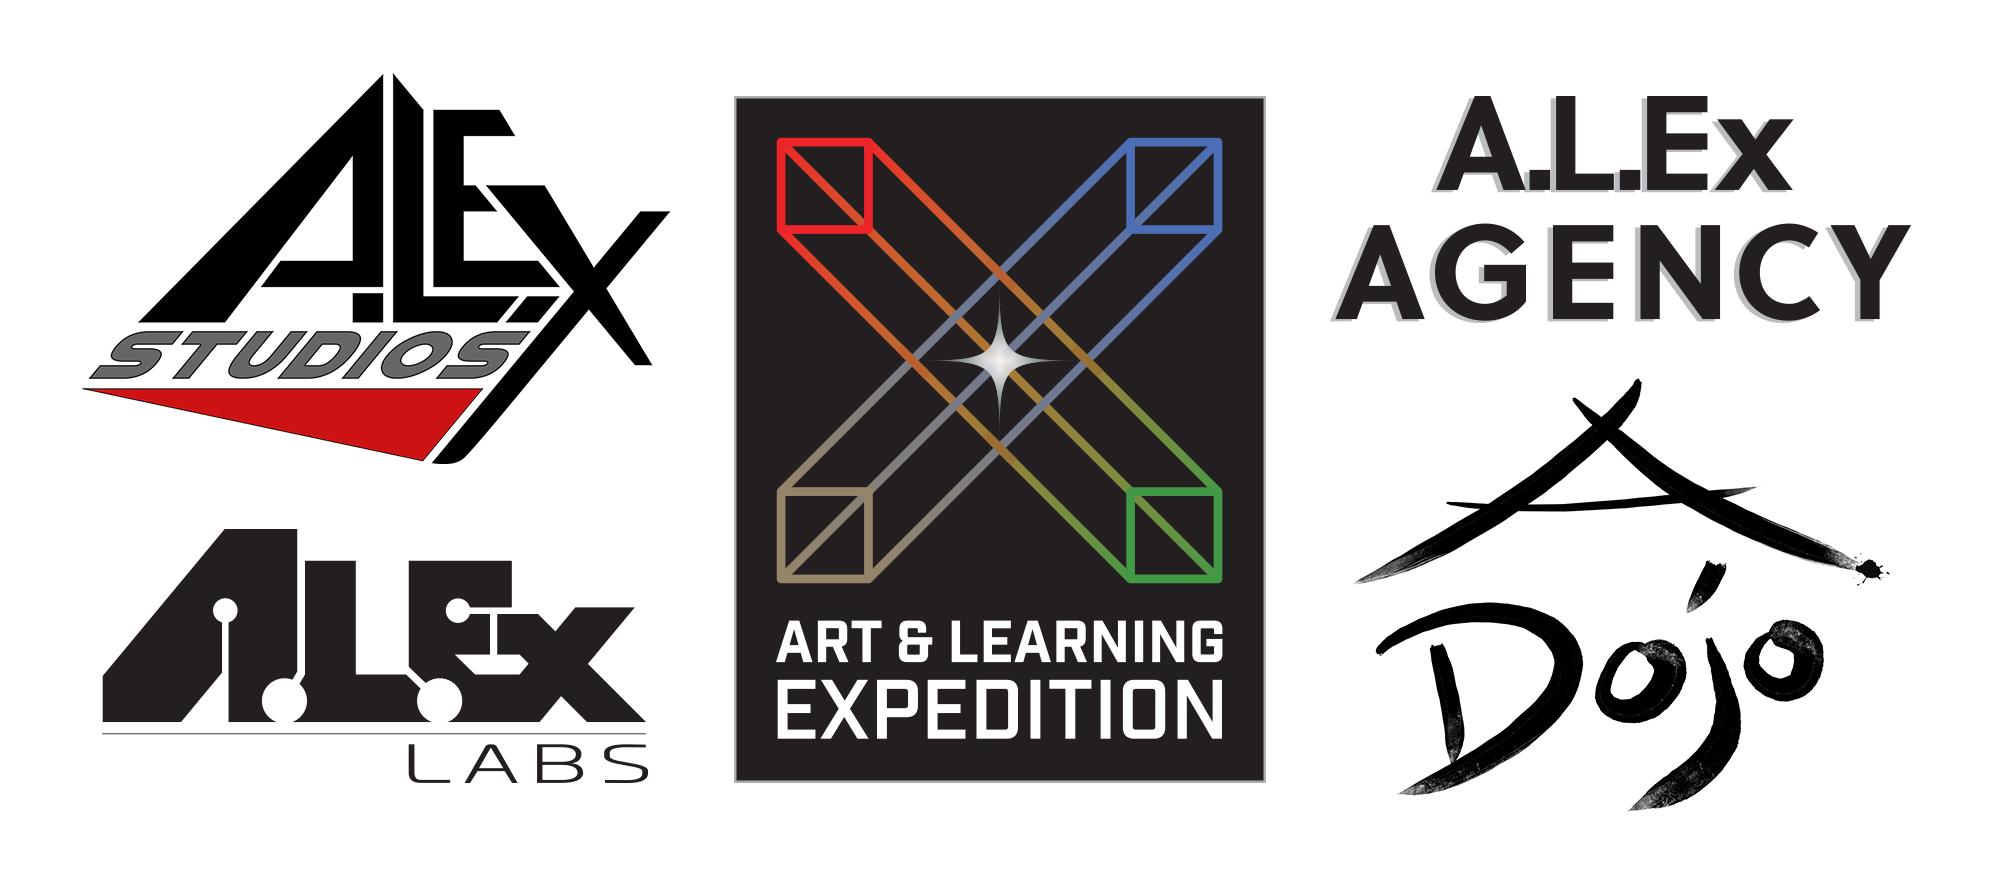 A.L.Ex.logos.jpg